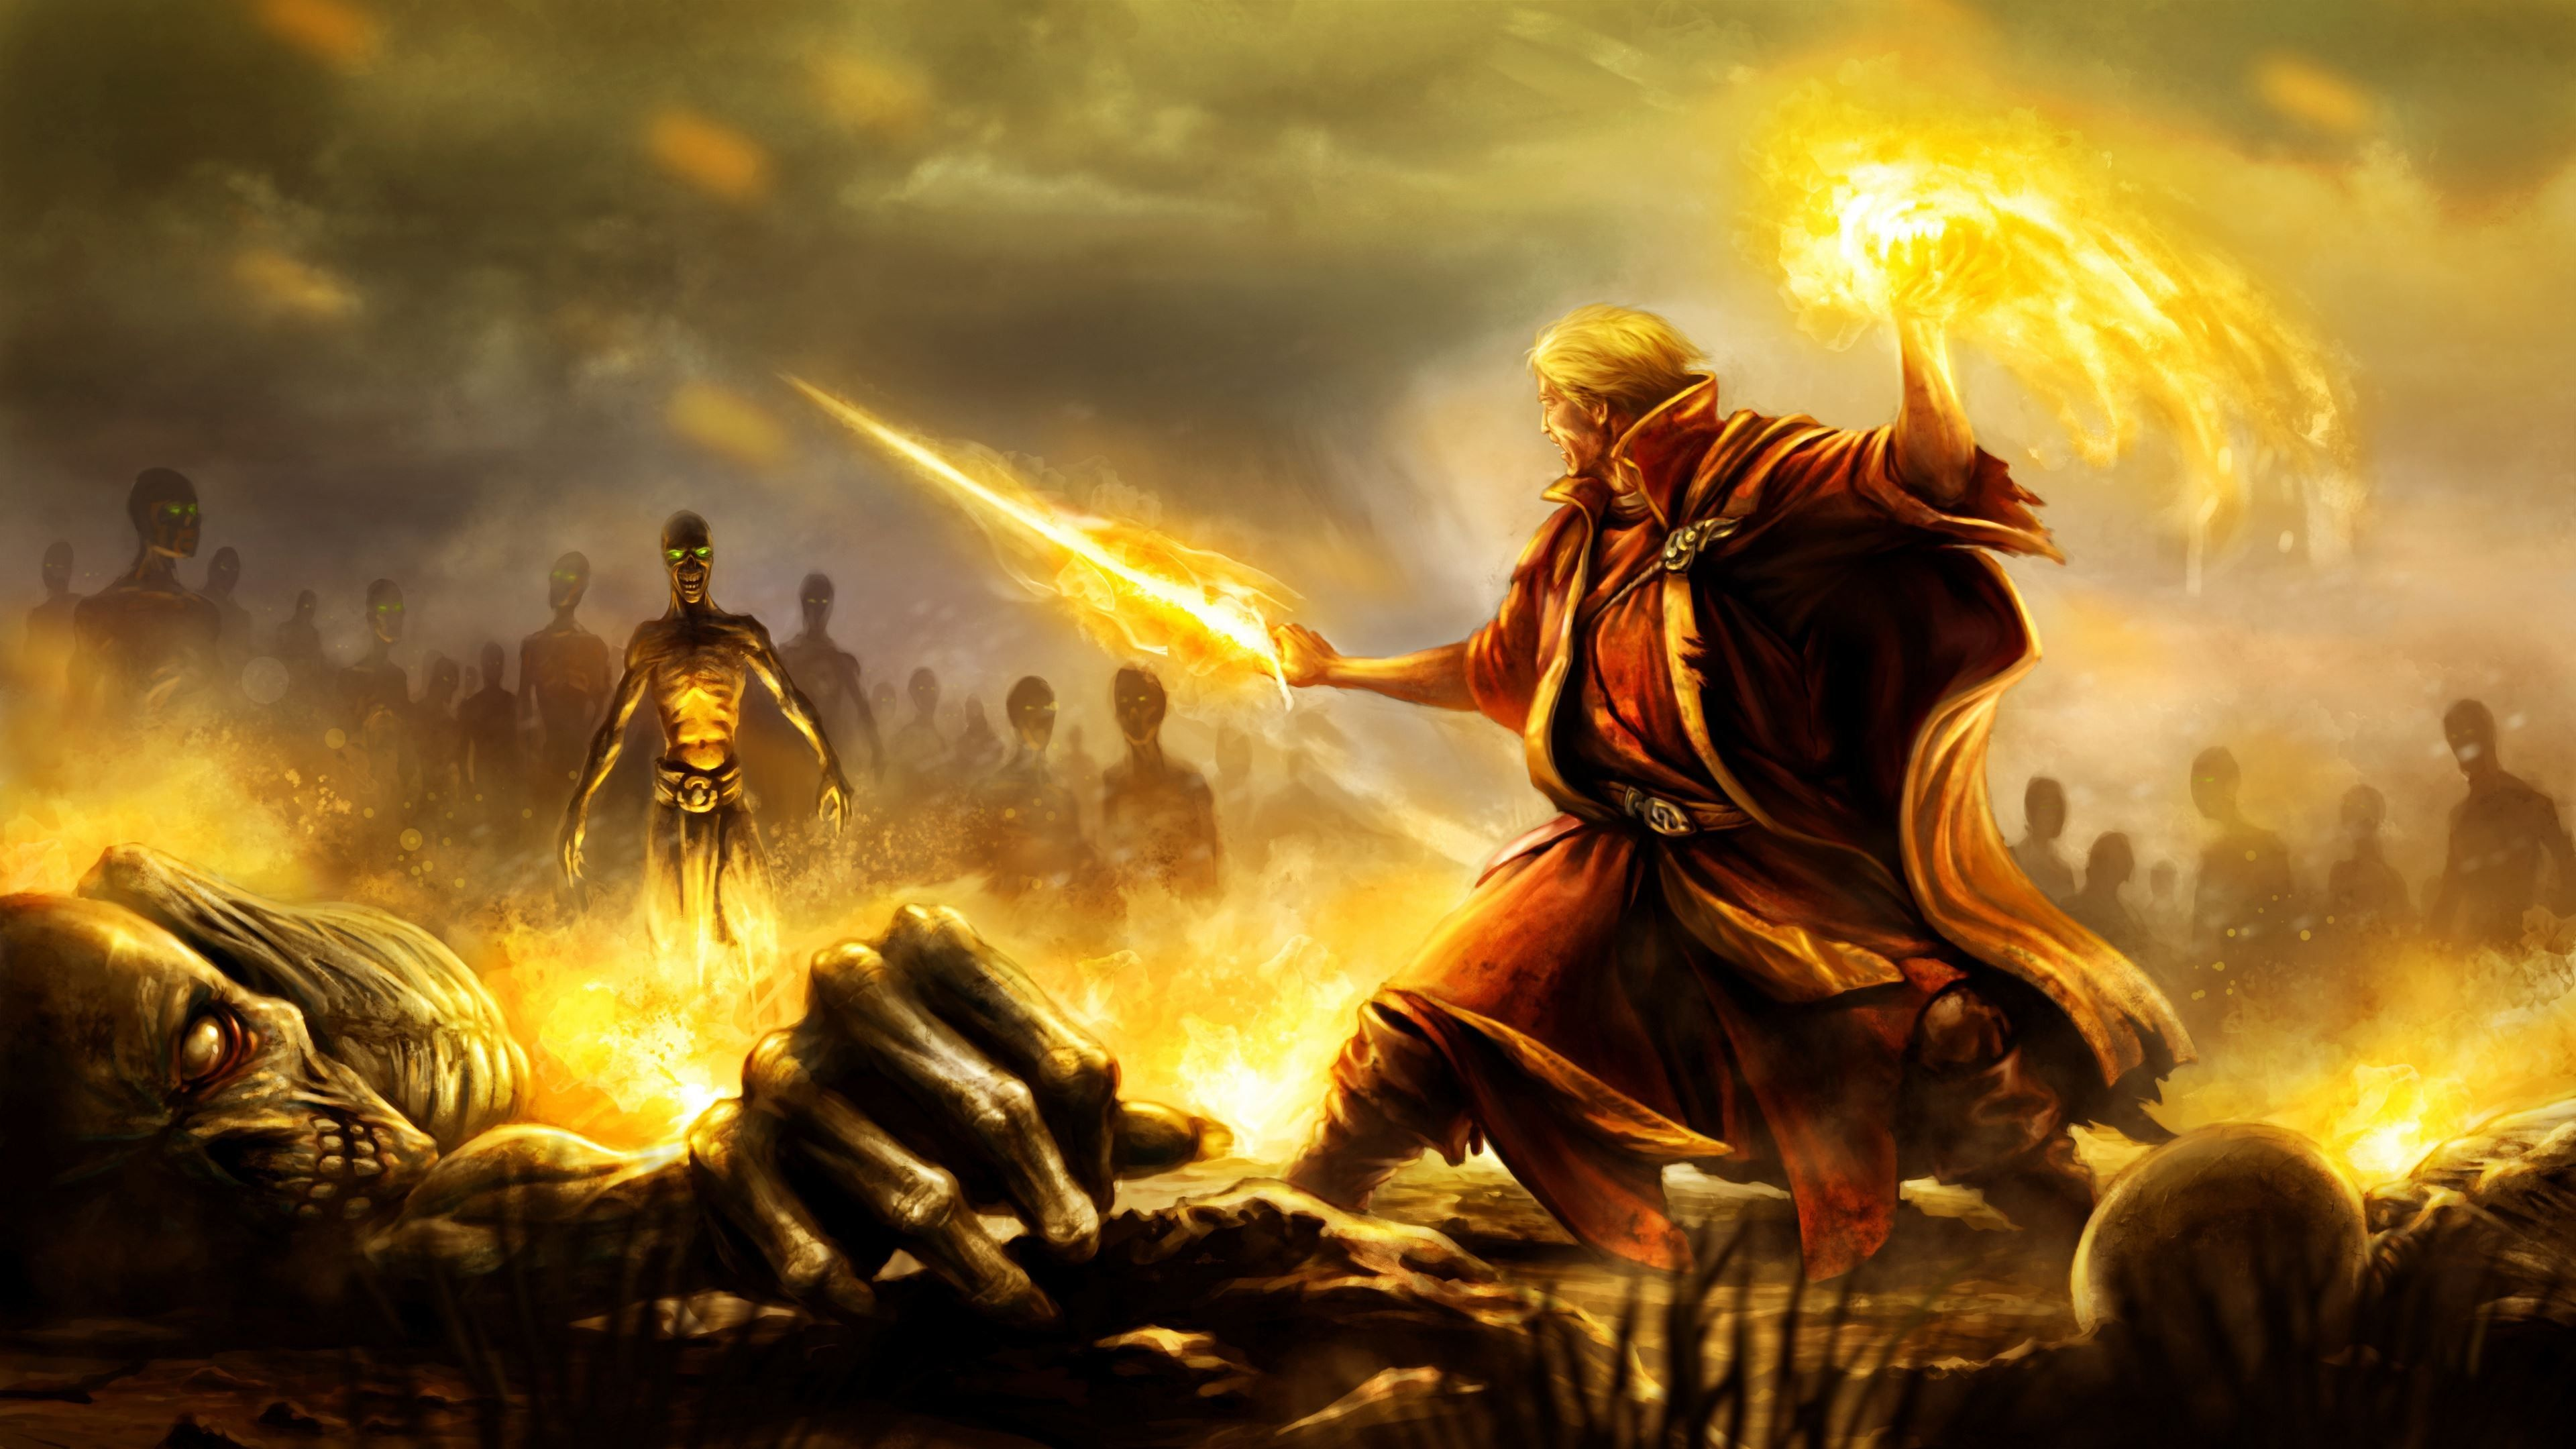 Battle Mage Art 3840x2160 Ultra Hd Wallpaper Mage Battle Mage Fantasy Wizard